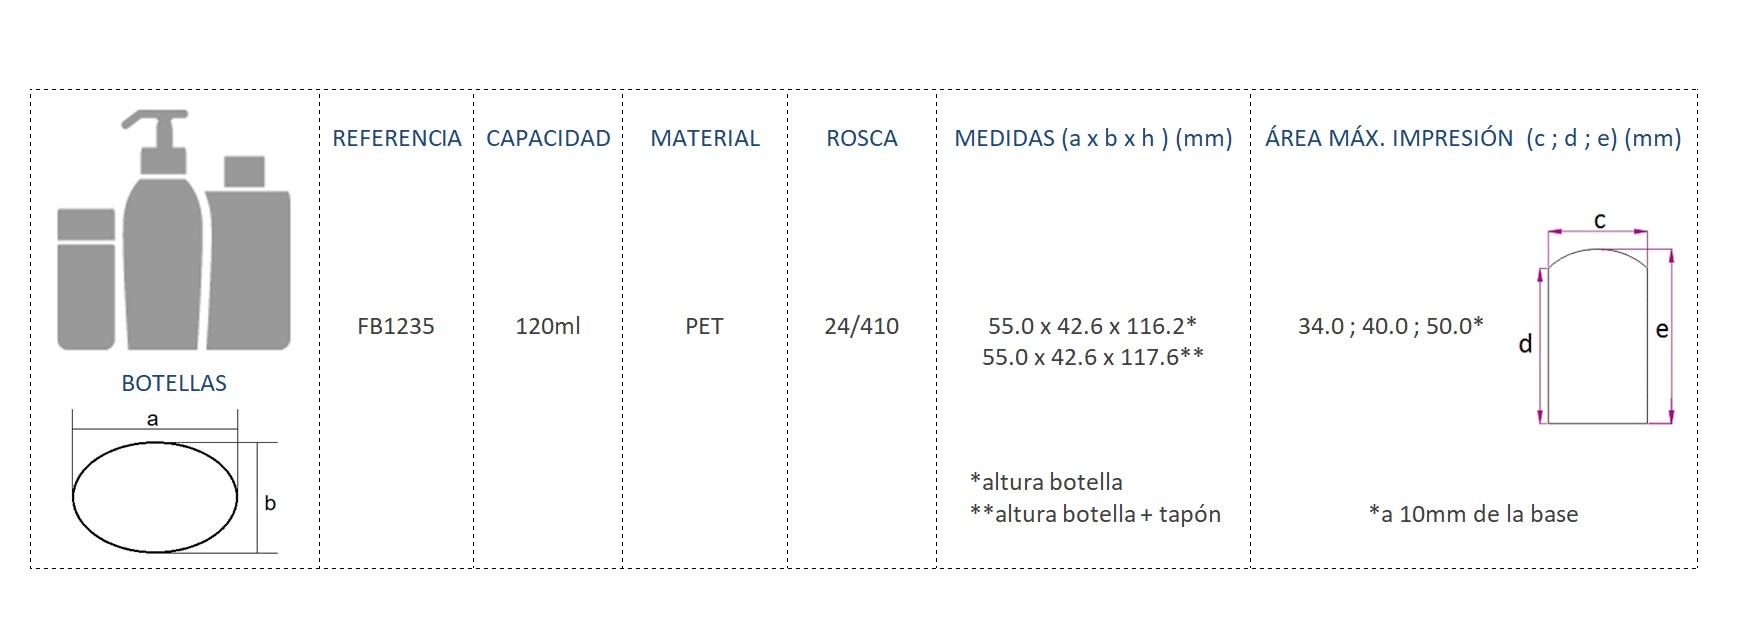 Cuadro de materiales botella FB1235